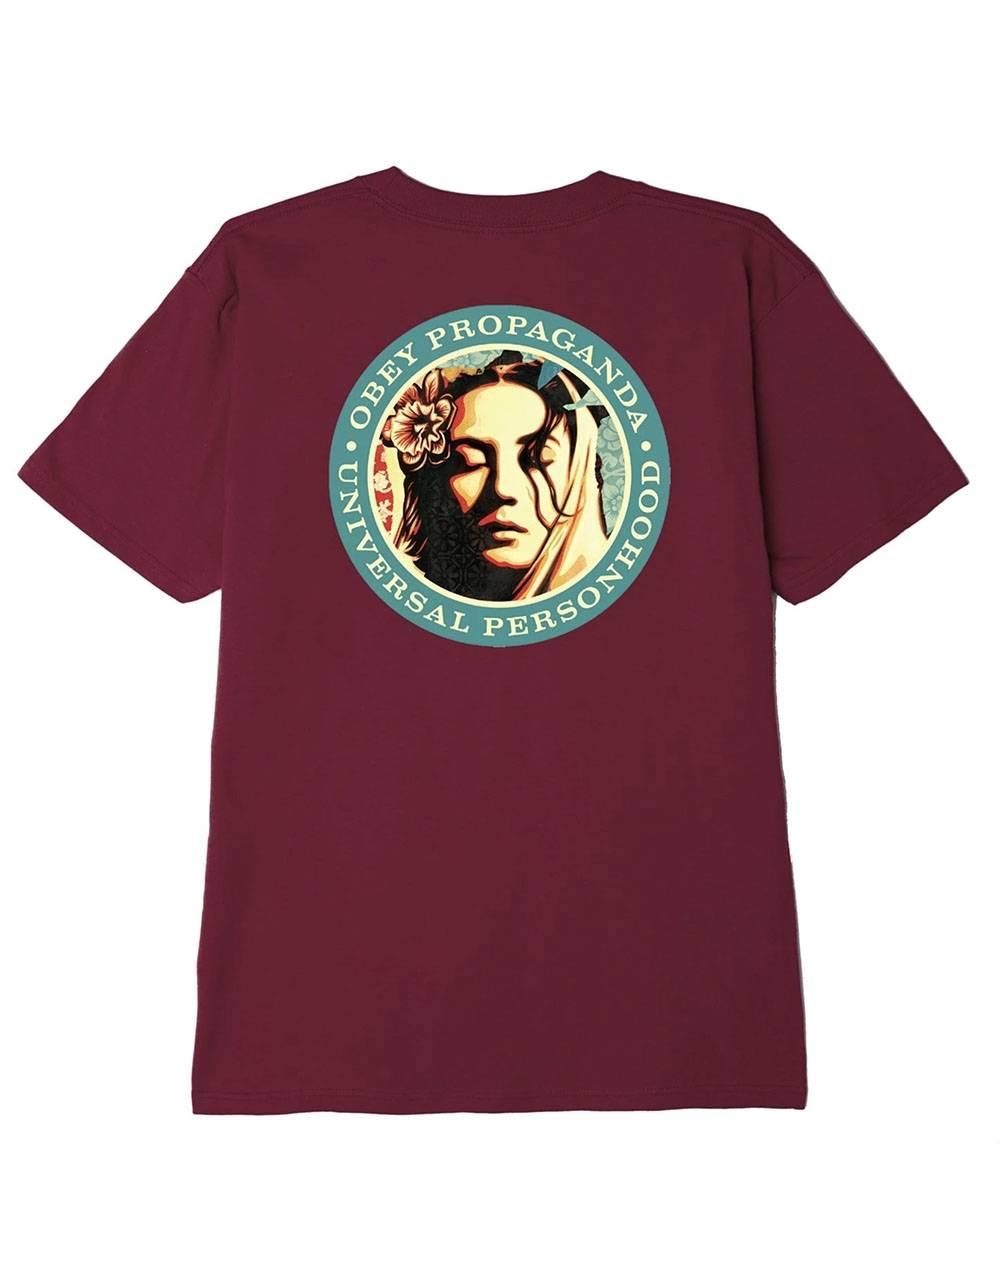 Obey Universal personhood classic t-shirt - burgundy obey T-shirt 45,00€